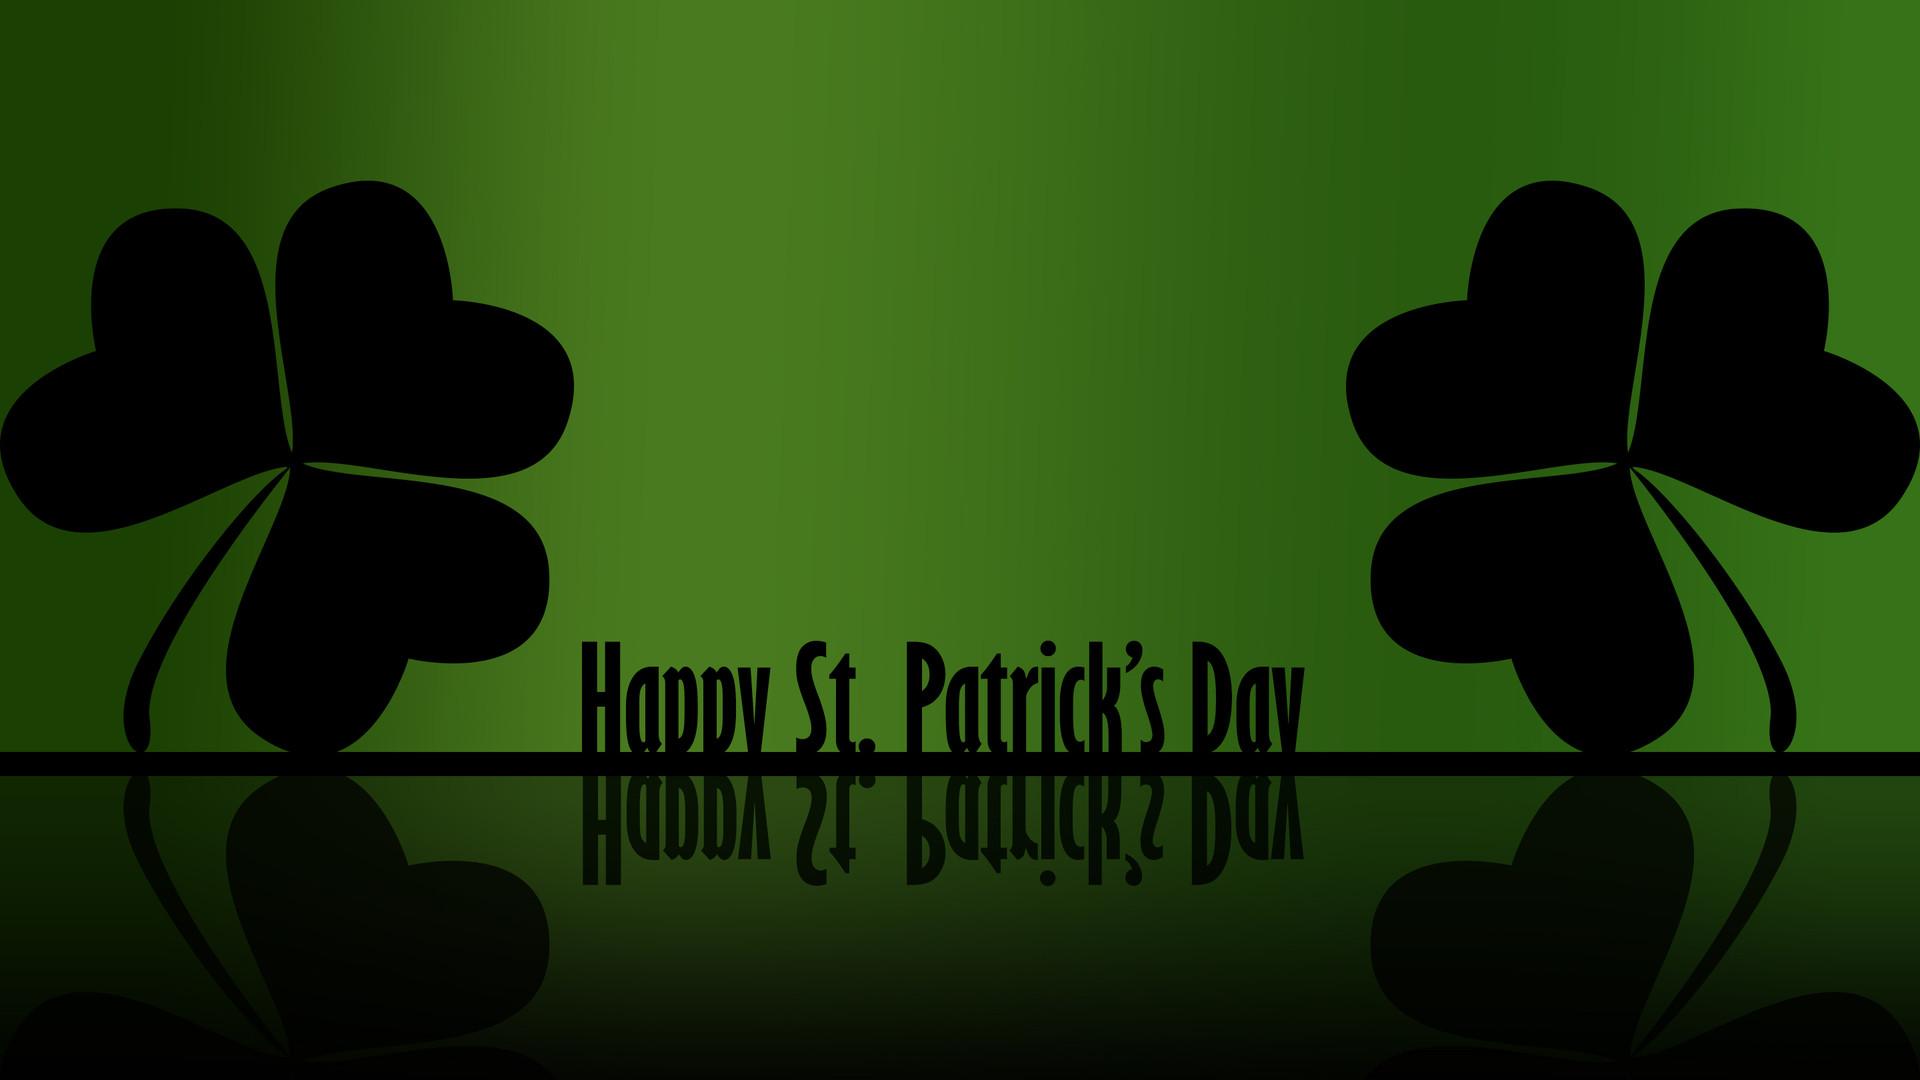 St. Patrick's Day HD Wallpaper St. …